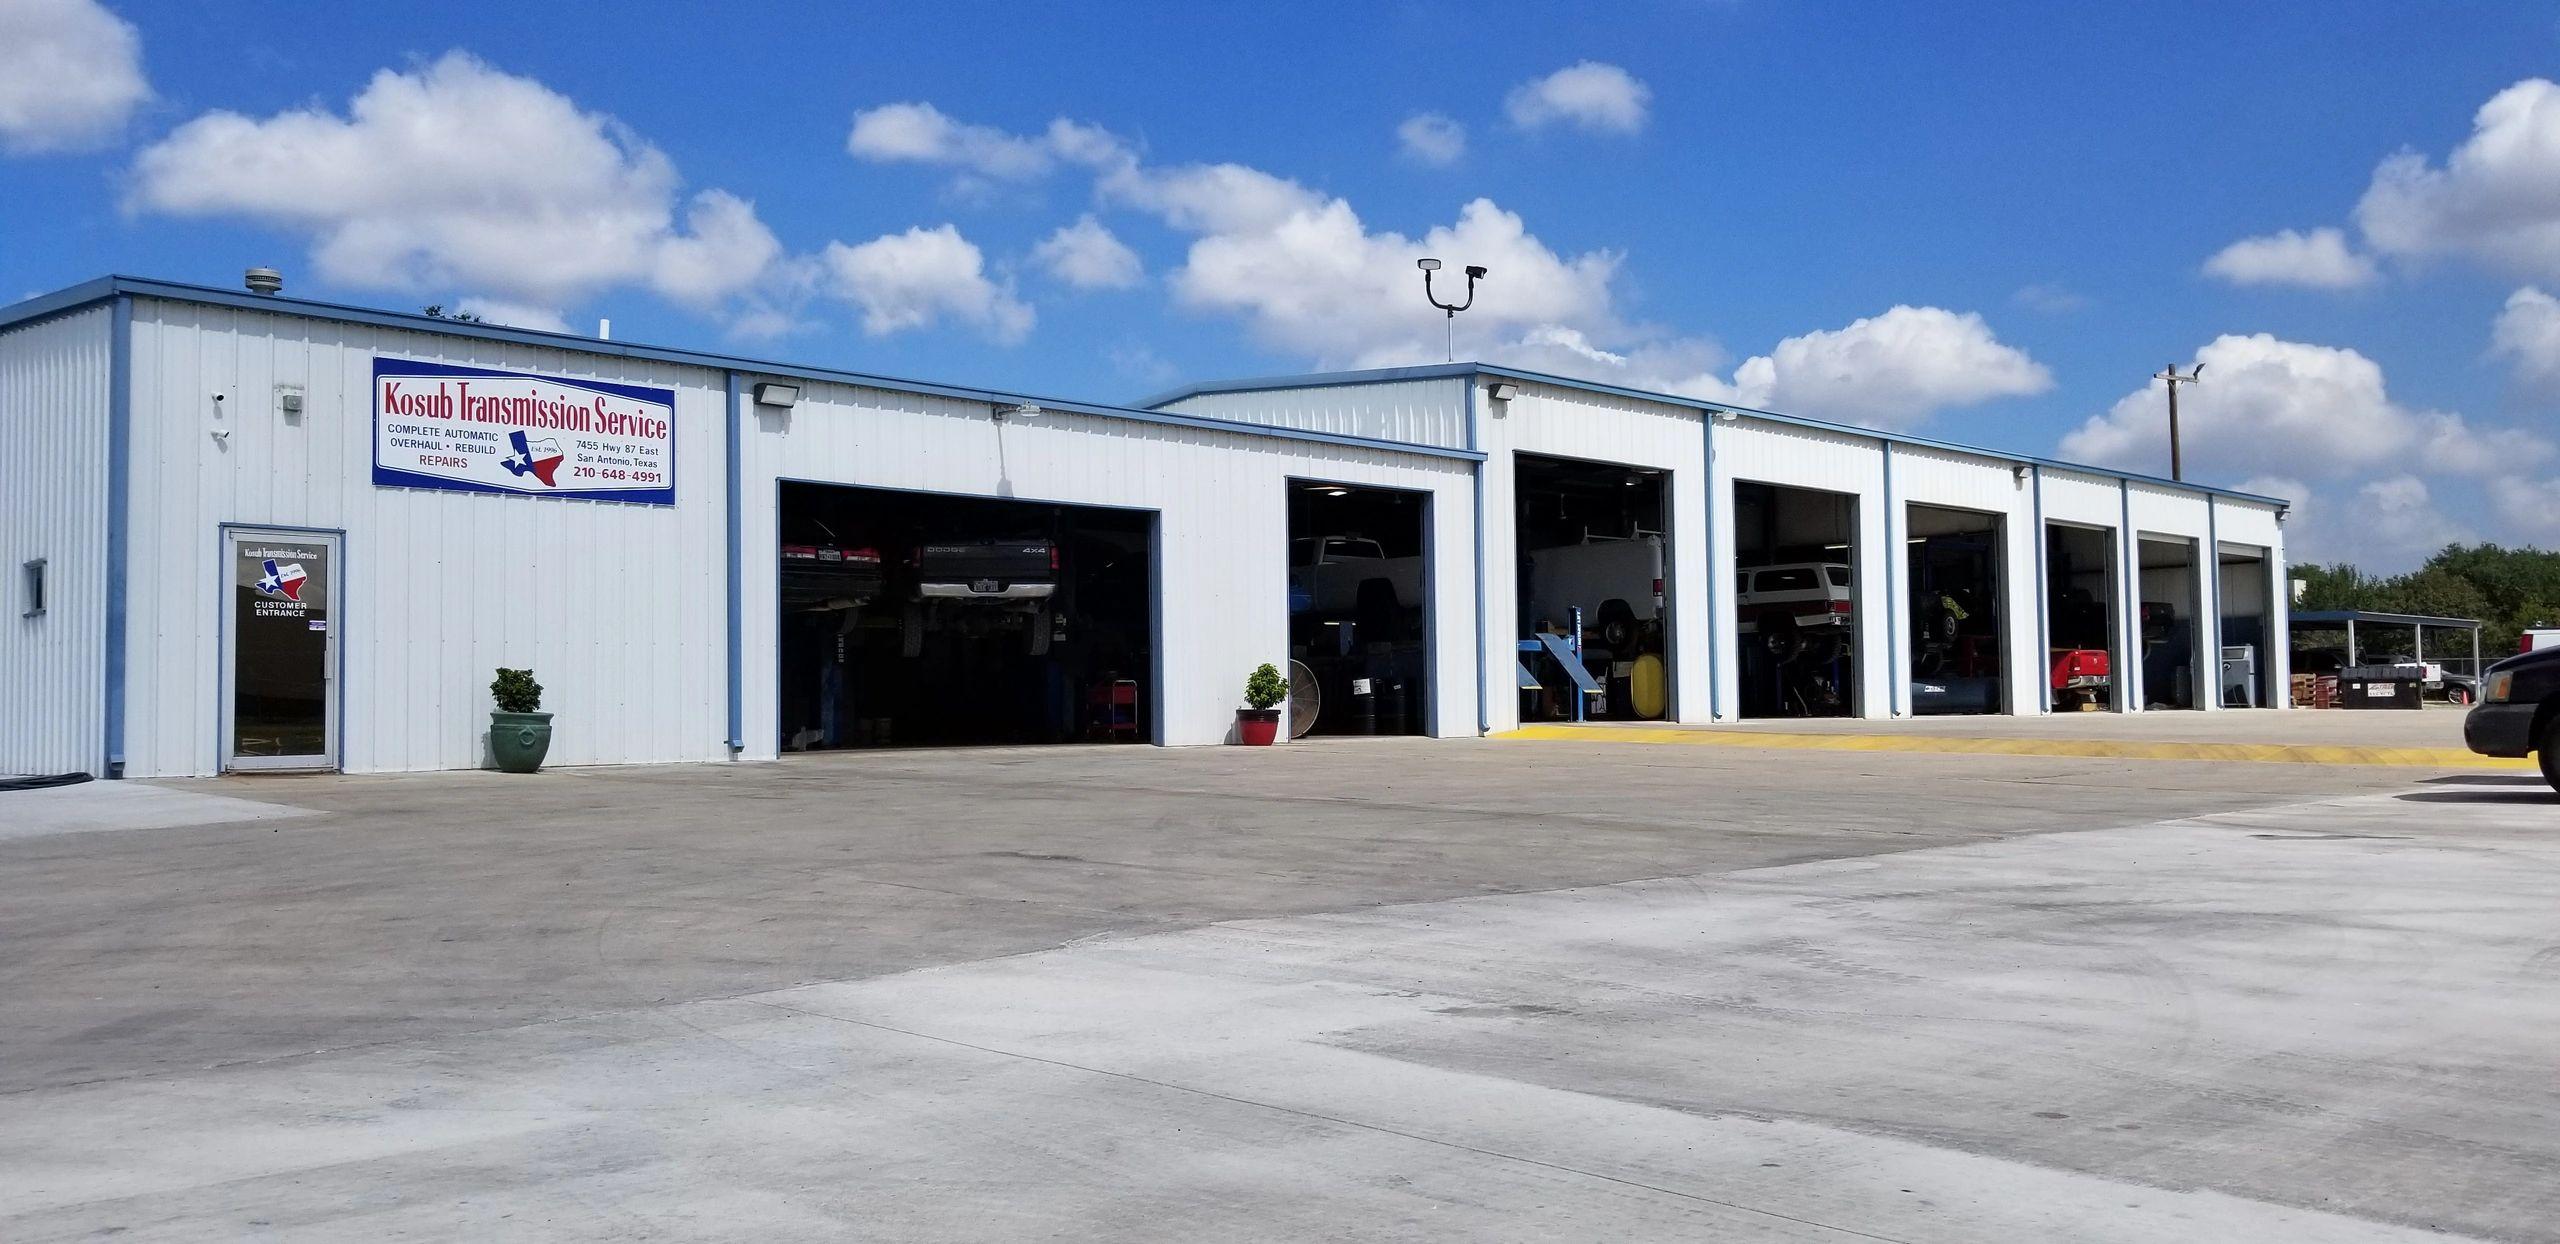 Gerald Kosub Transmission Service Inc Of San Antonio Texas